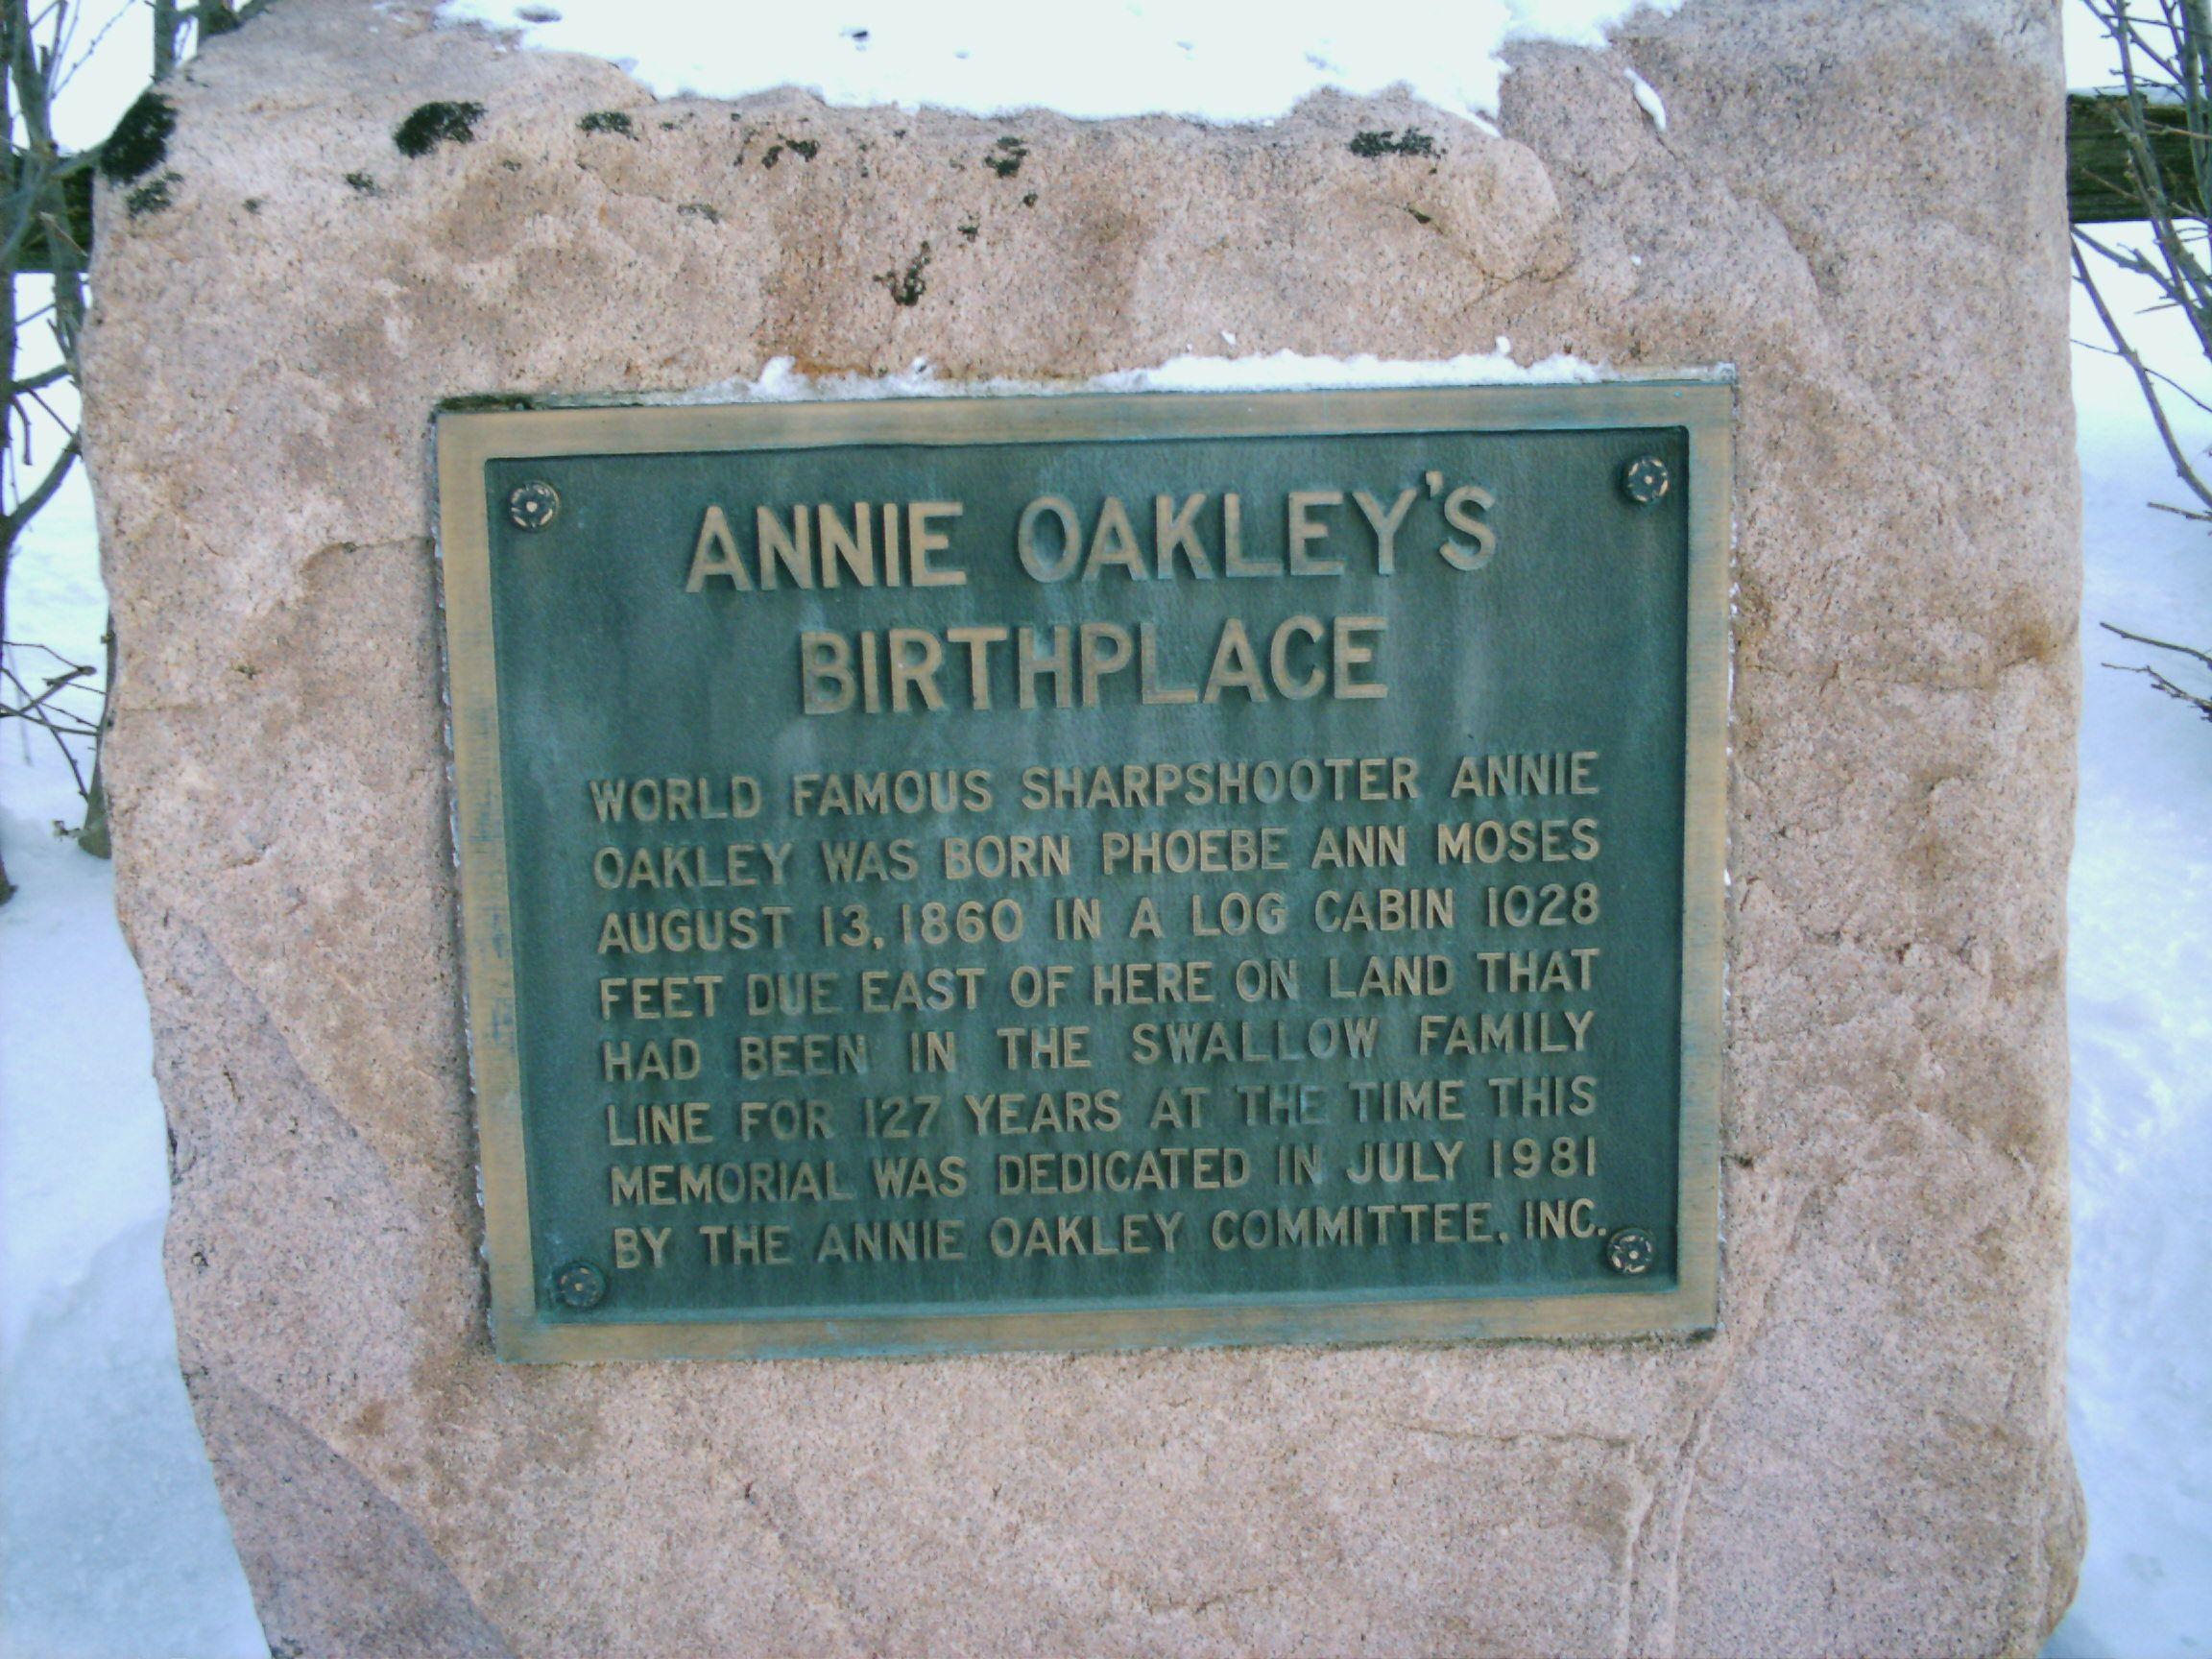 Ohio darke county north star - Yorkshire Oh Darke County A Closer Look At Annie Oakley S Birthplace Marker